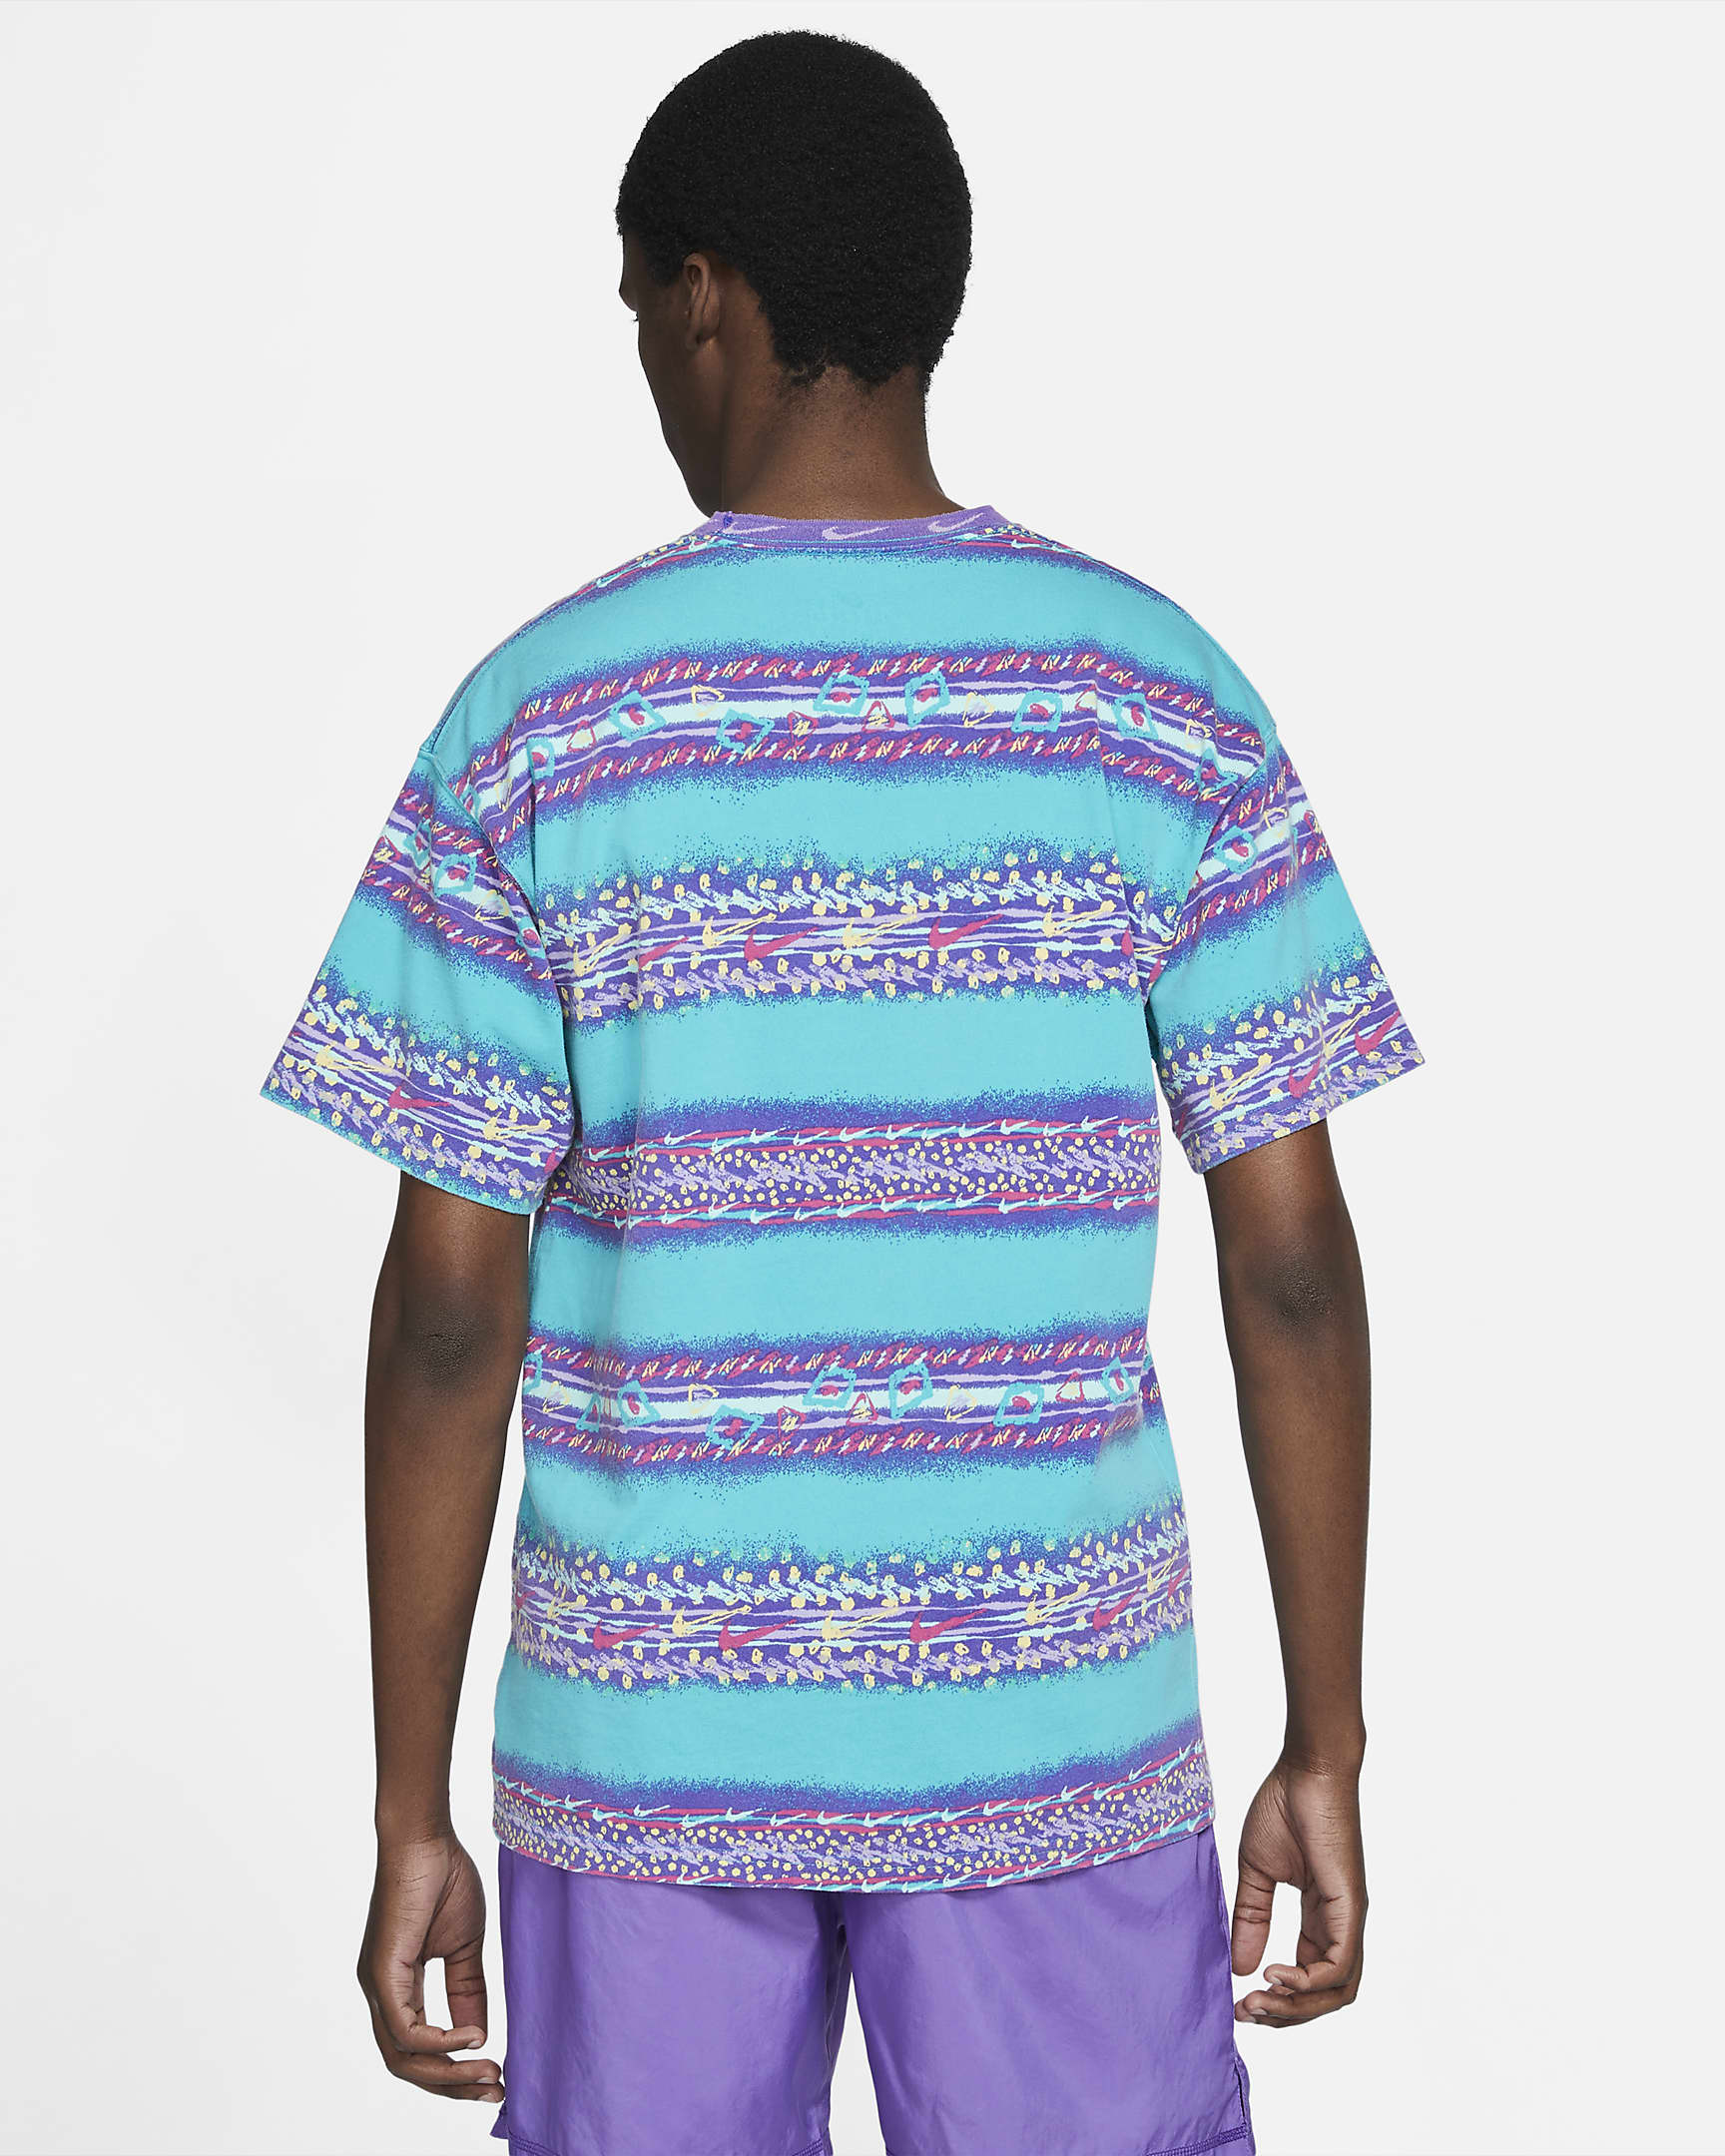 nike-sportswear-stories-mens-max-90-t-shirt-7vVnv1-1.png